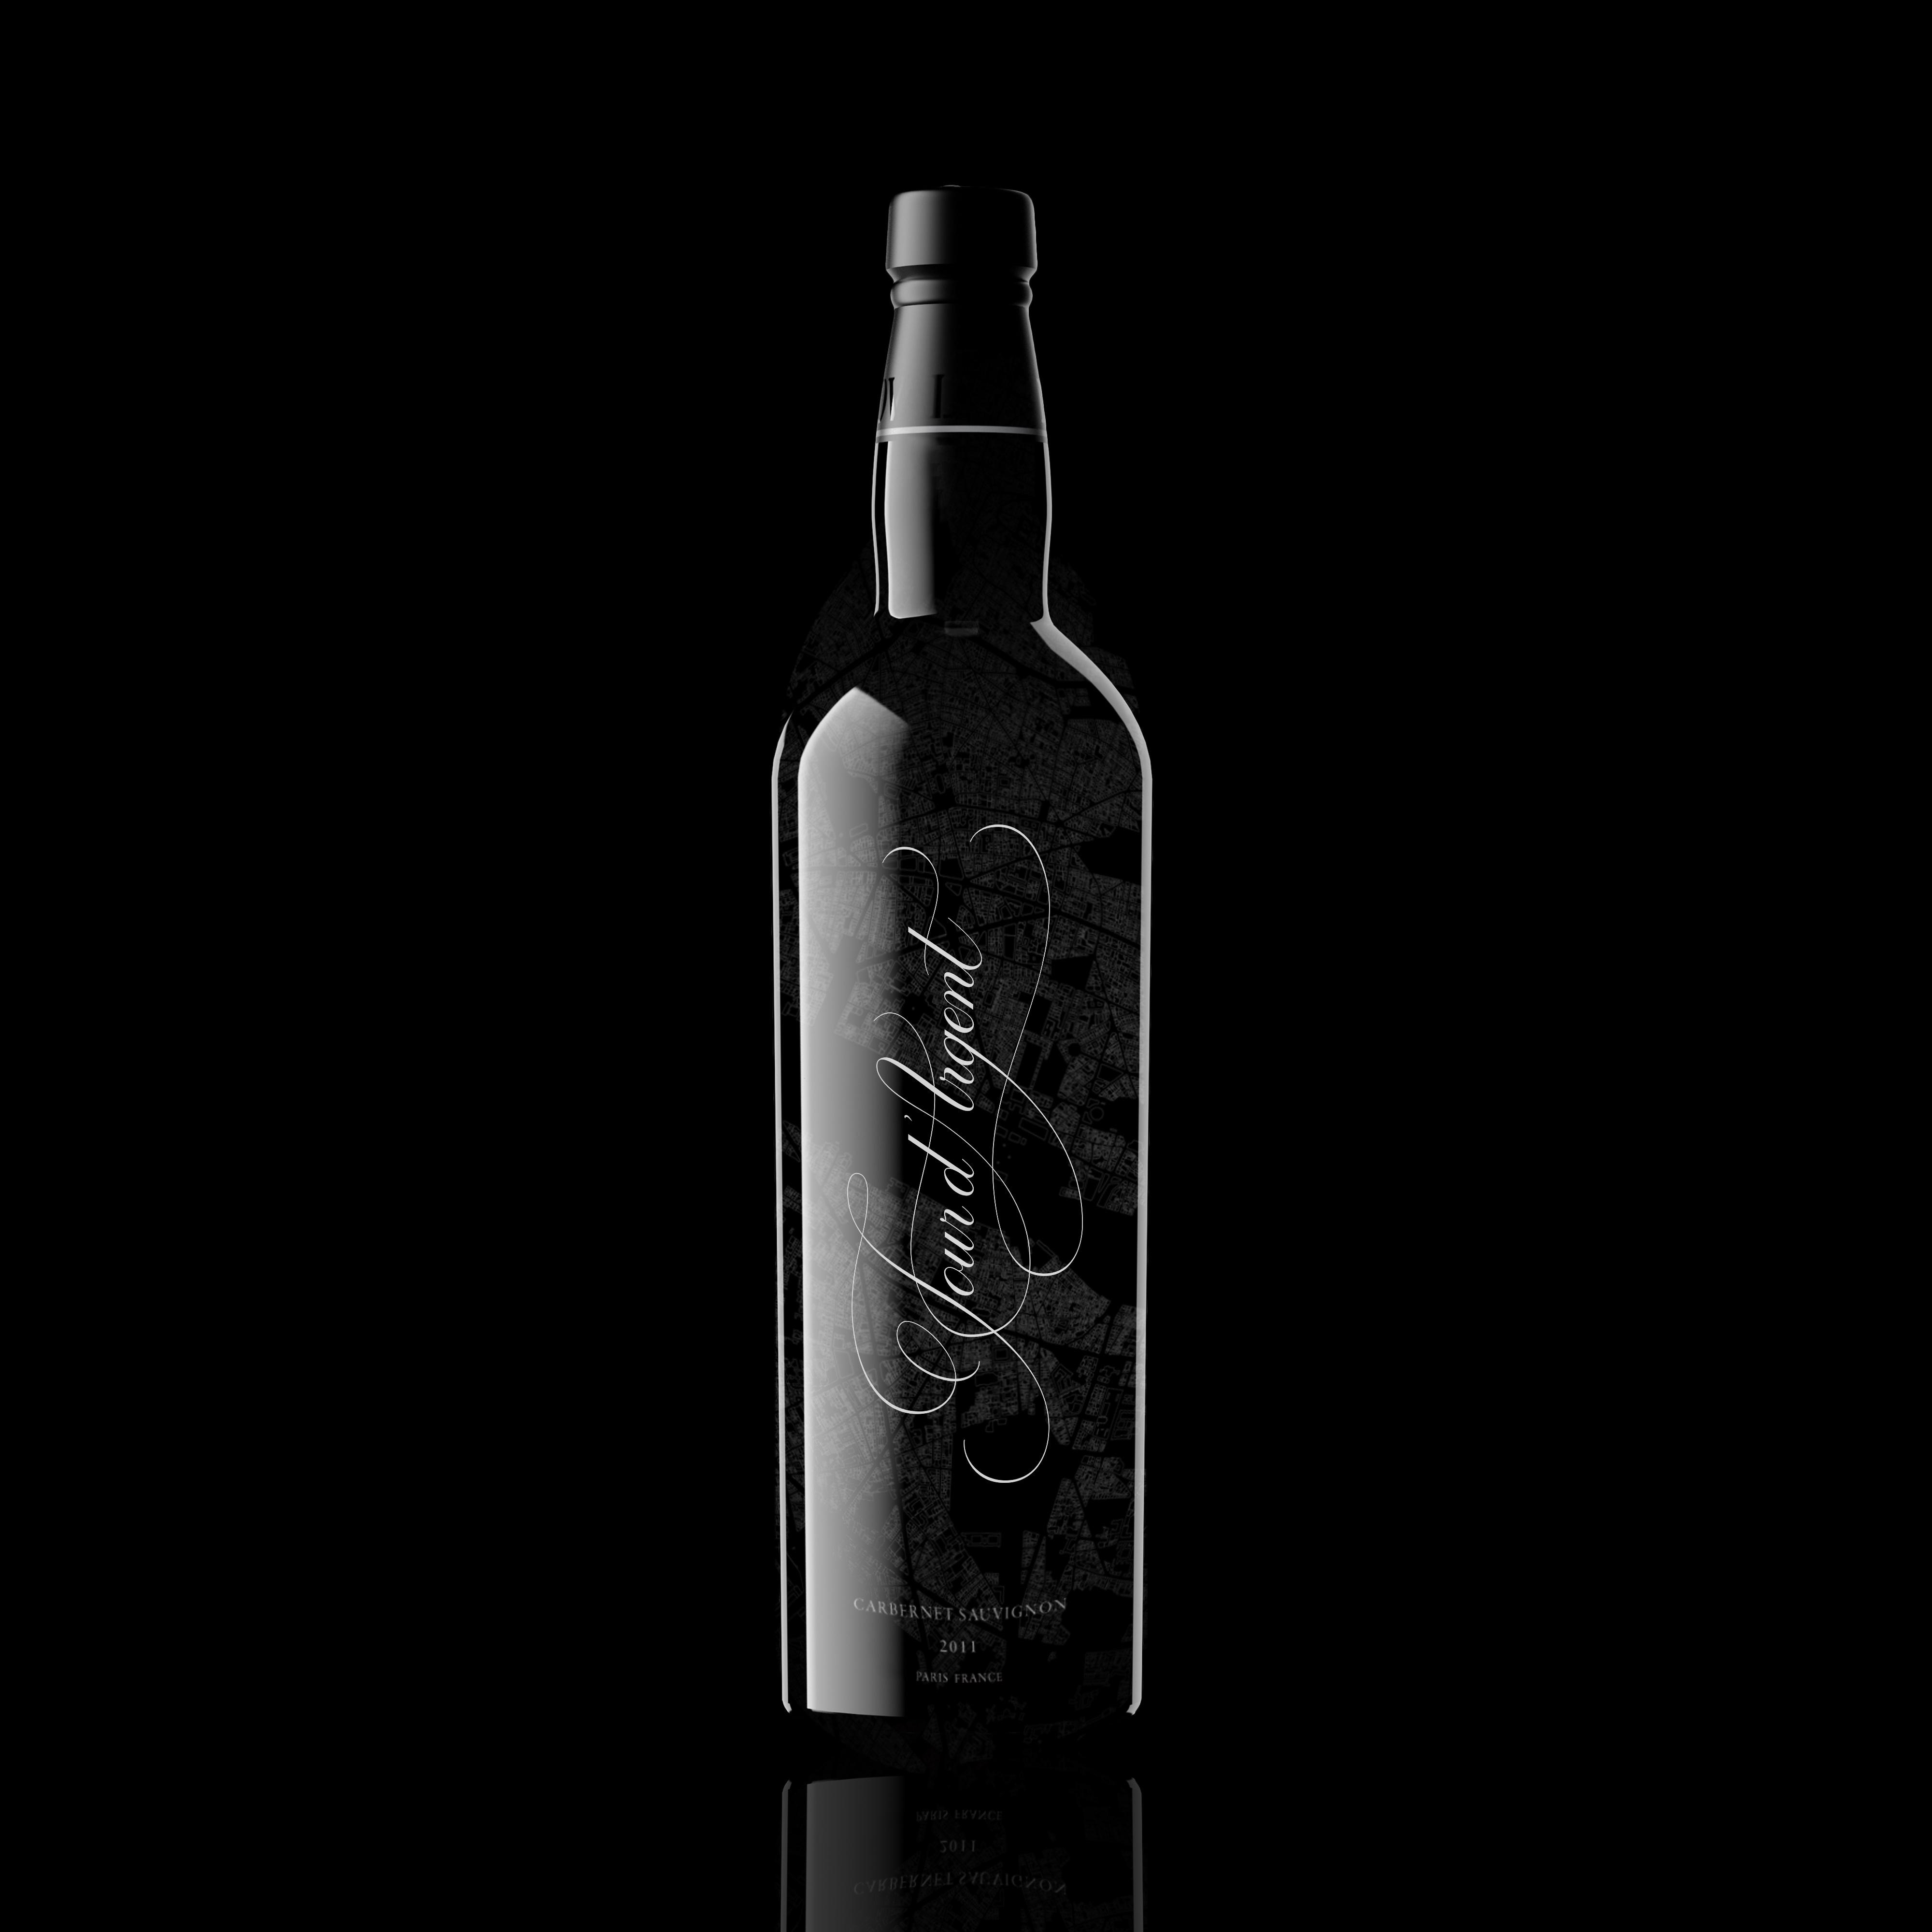 tourd-argent-wine